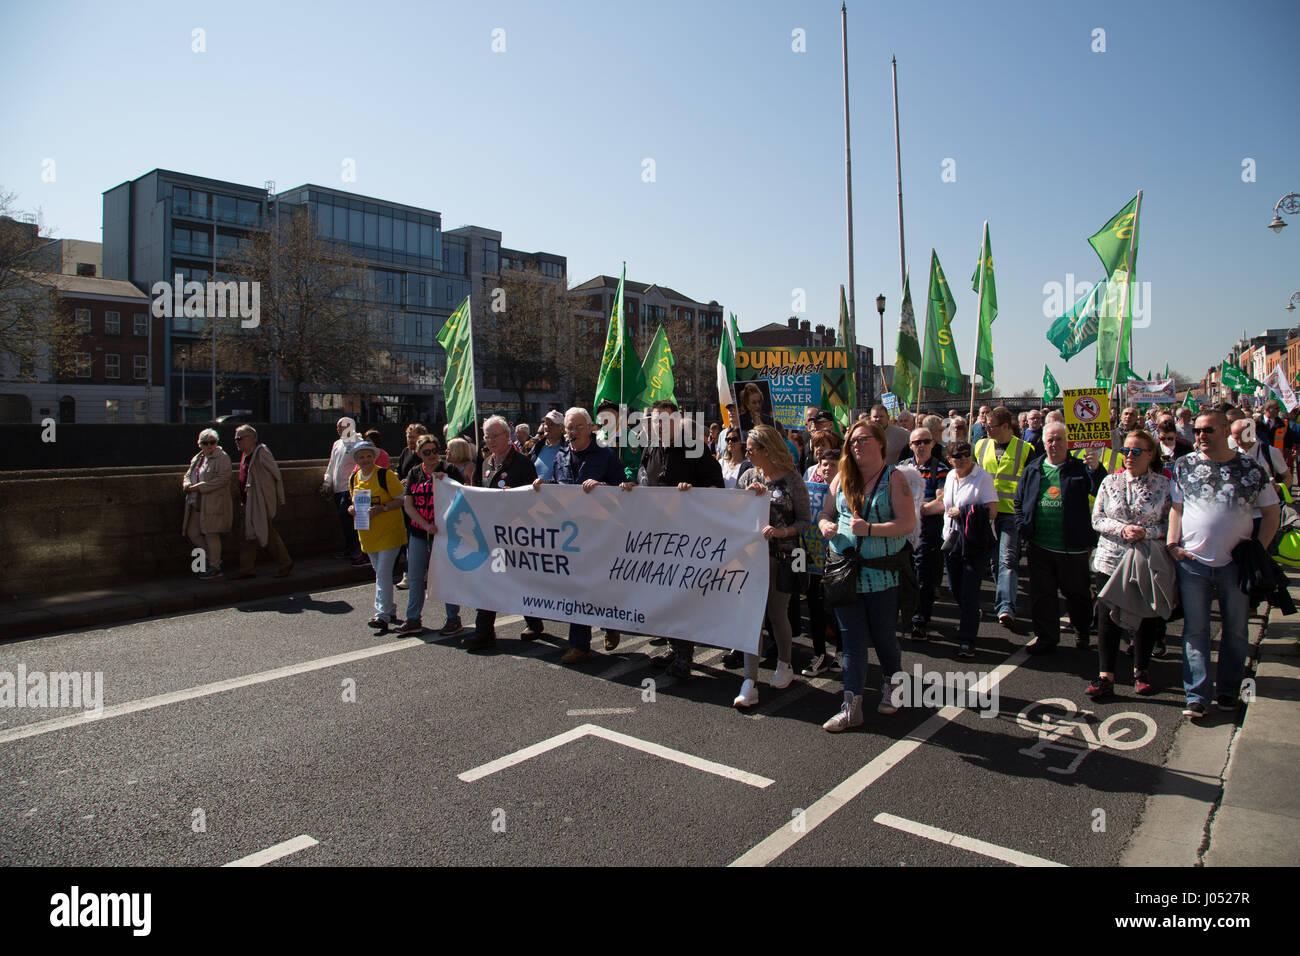 Anti-austerity protestors march through Dublin city, Ireland. - Stock Image